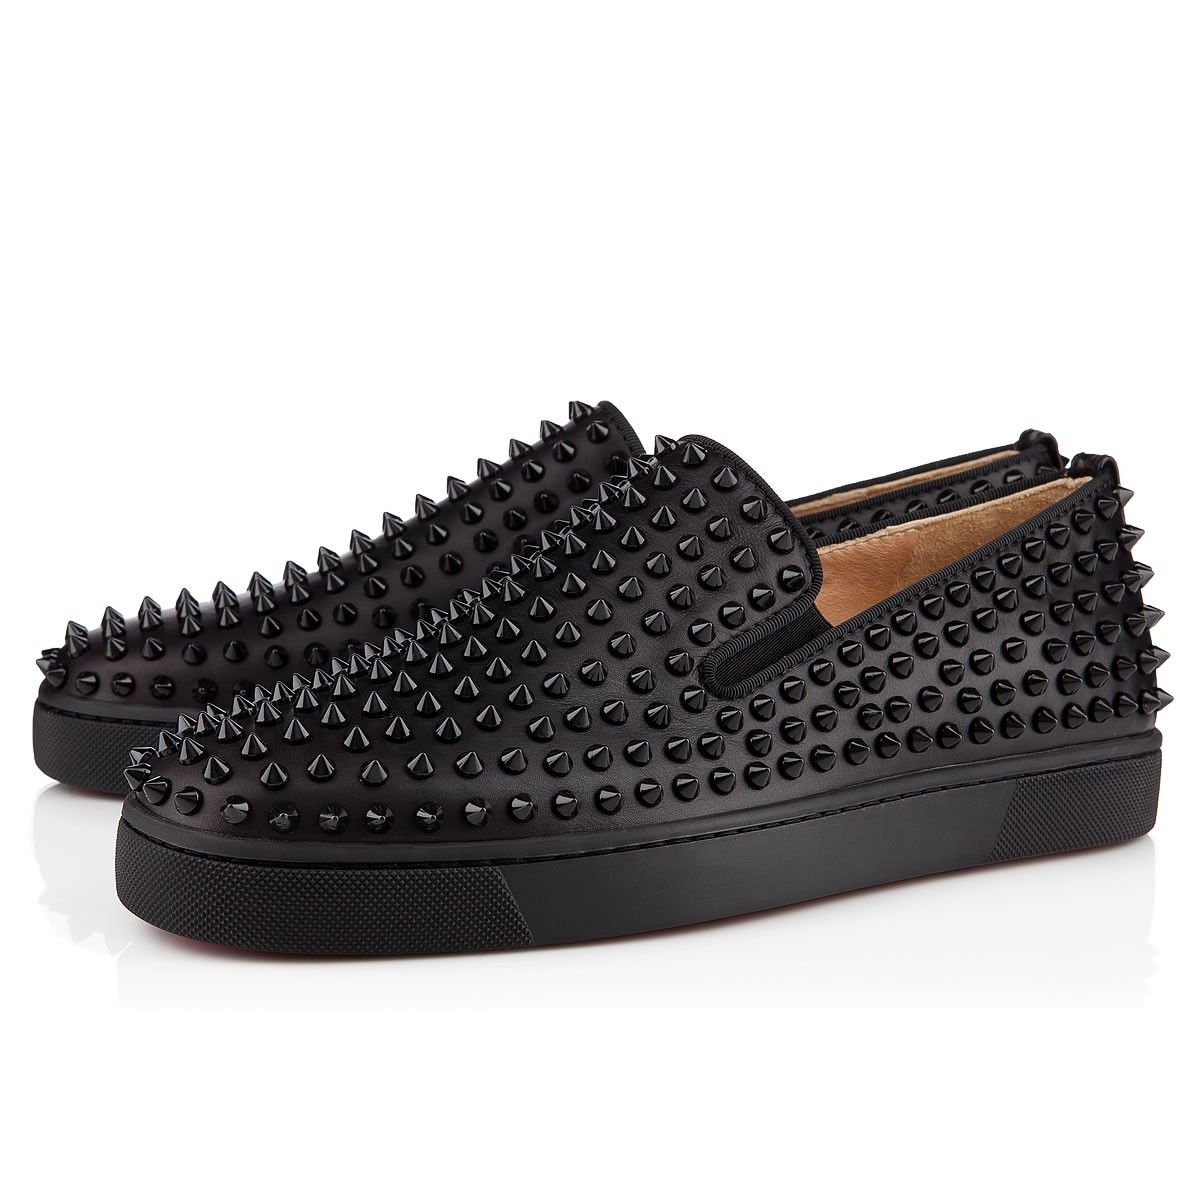 aaf87adad78 Roller-Boat Black/Black Leather - Men Shoes - Christian Louboutin in ...